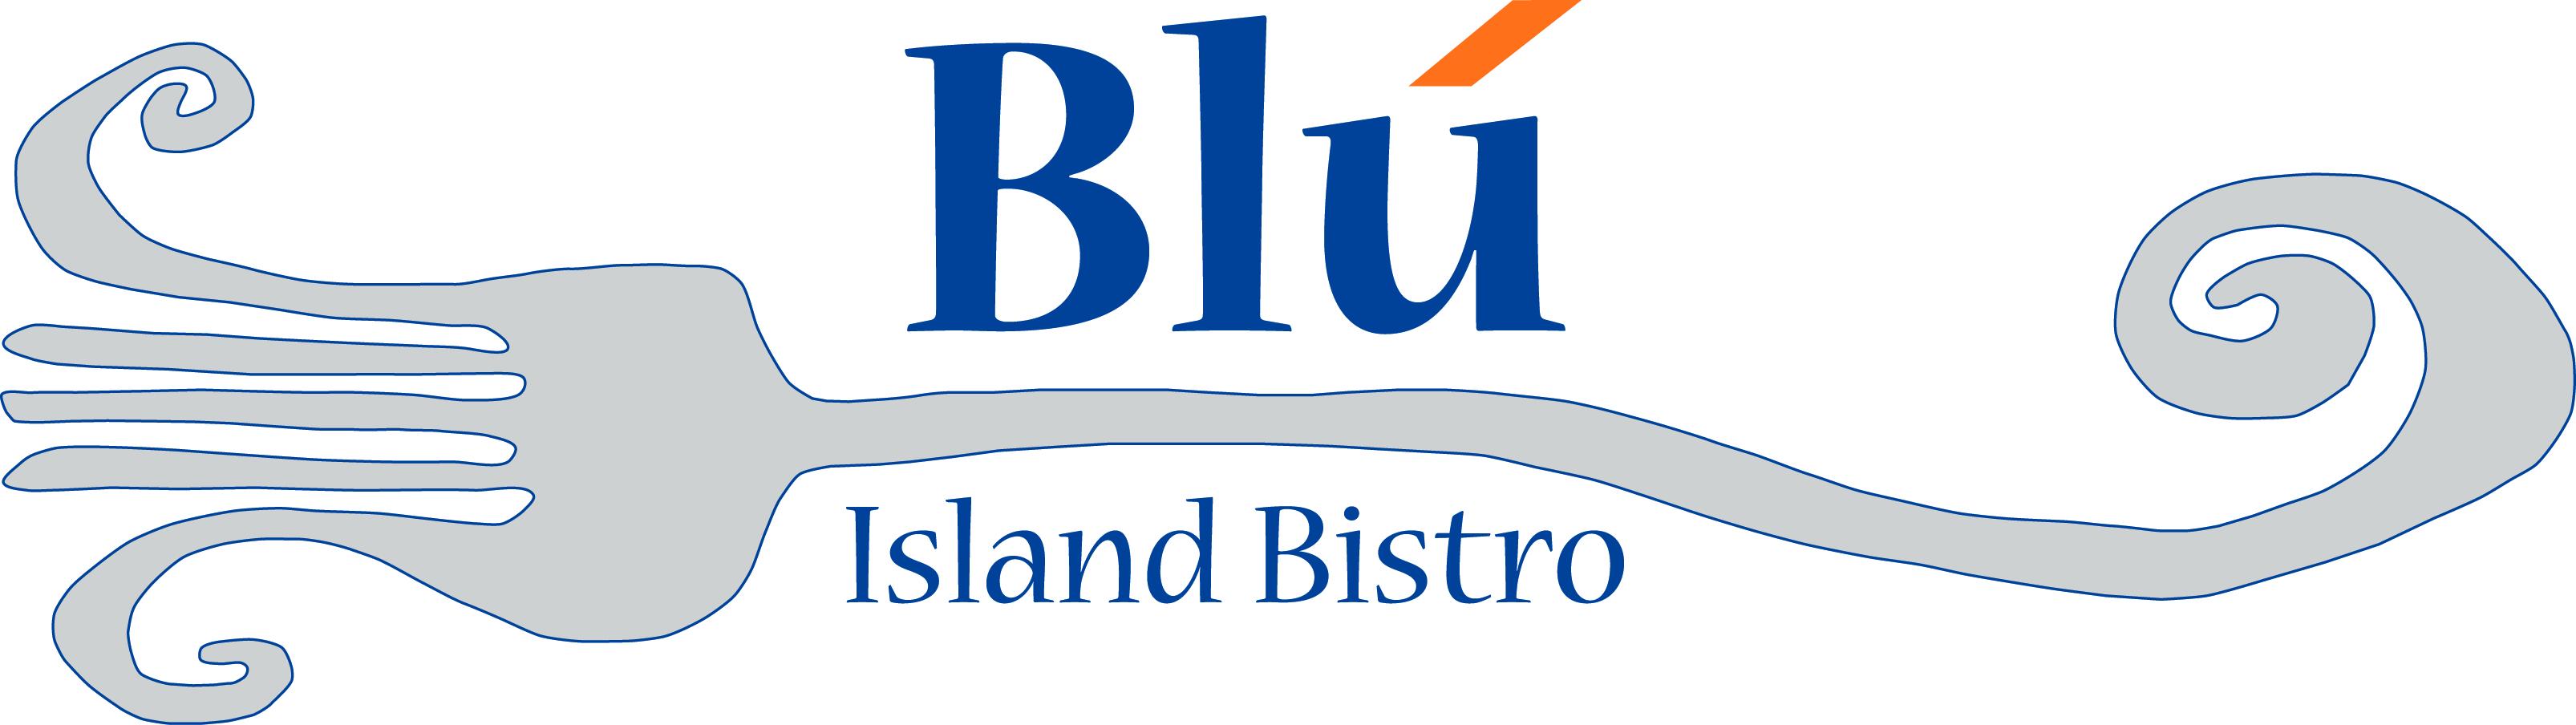 Blu Island Bistro Logo